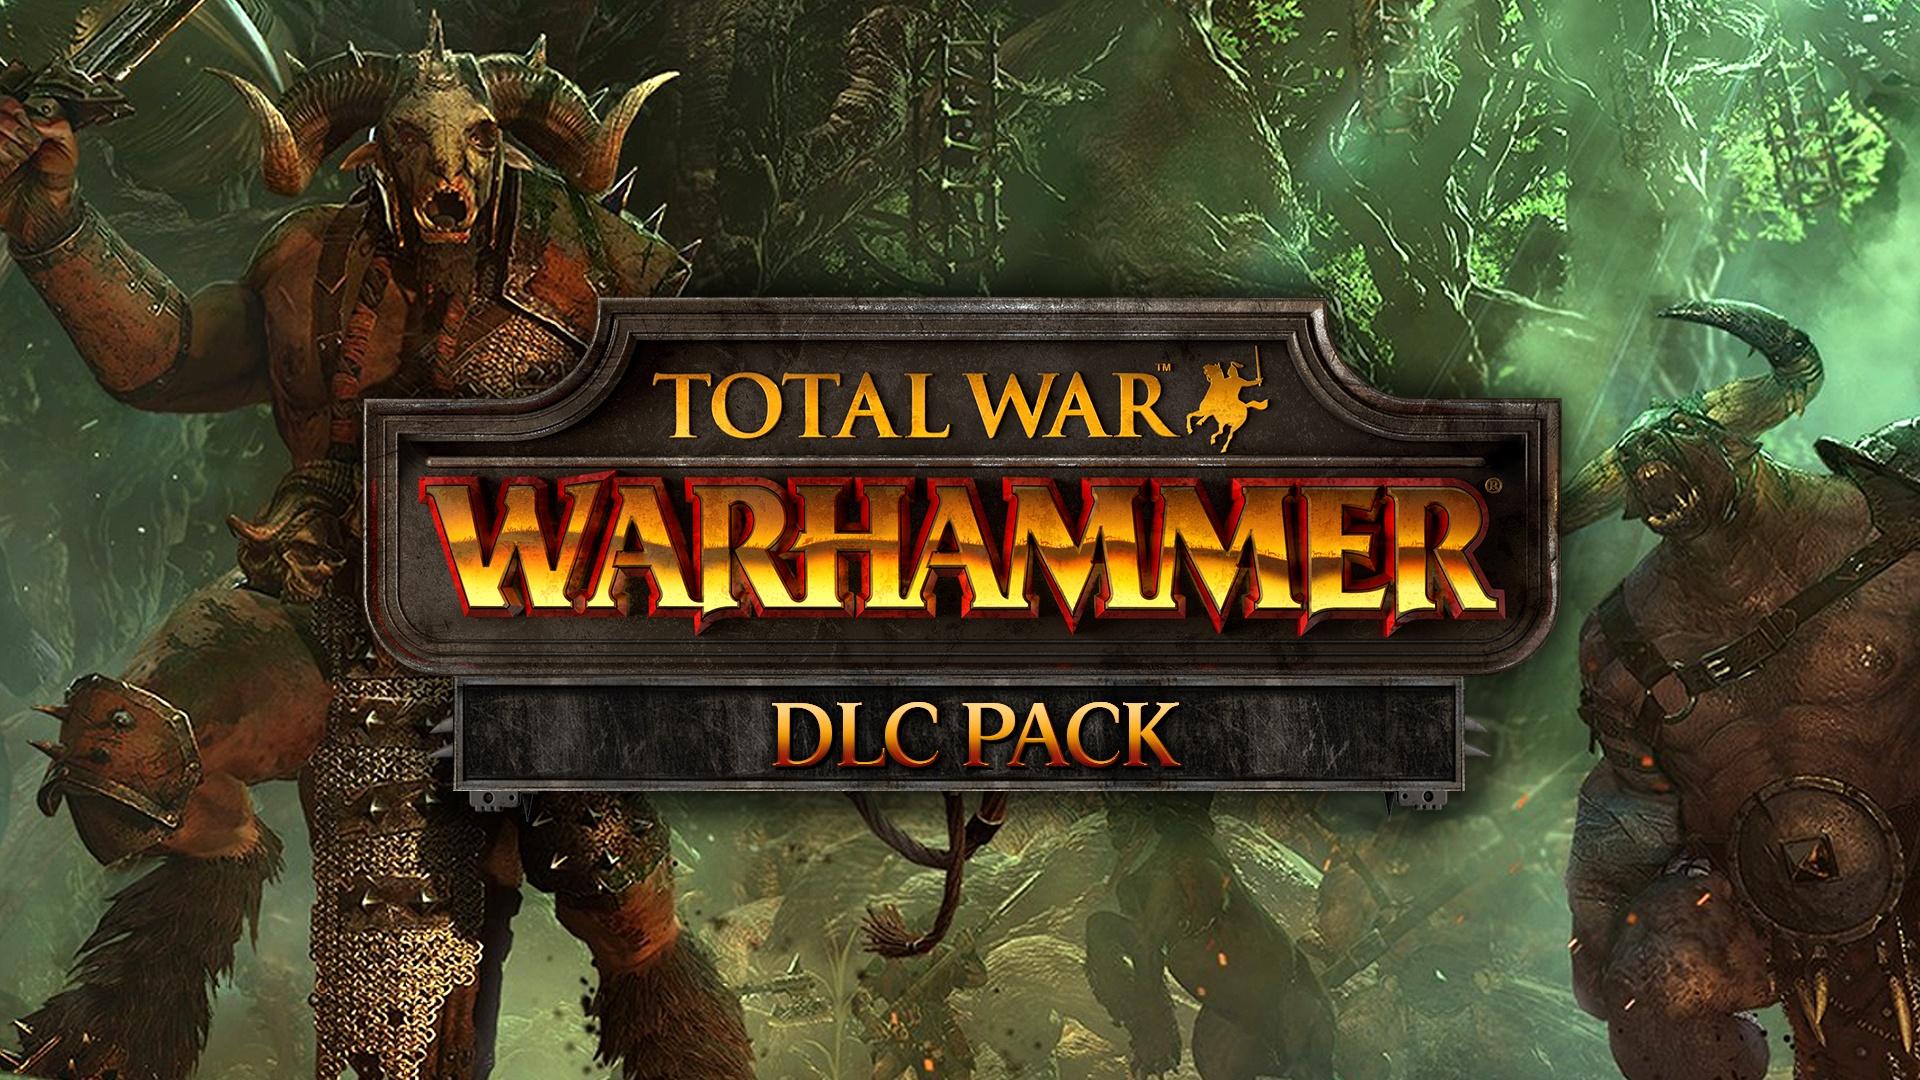 Total War WARHAMMER DLC Pack | Steam Game Bundle | Fanatical